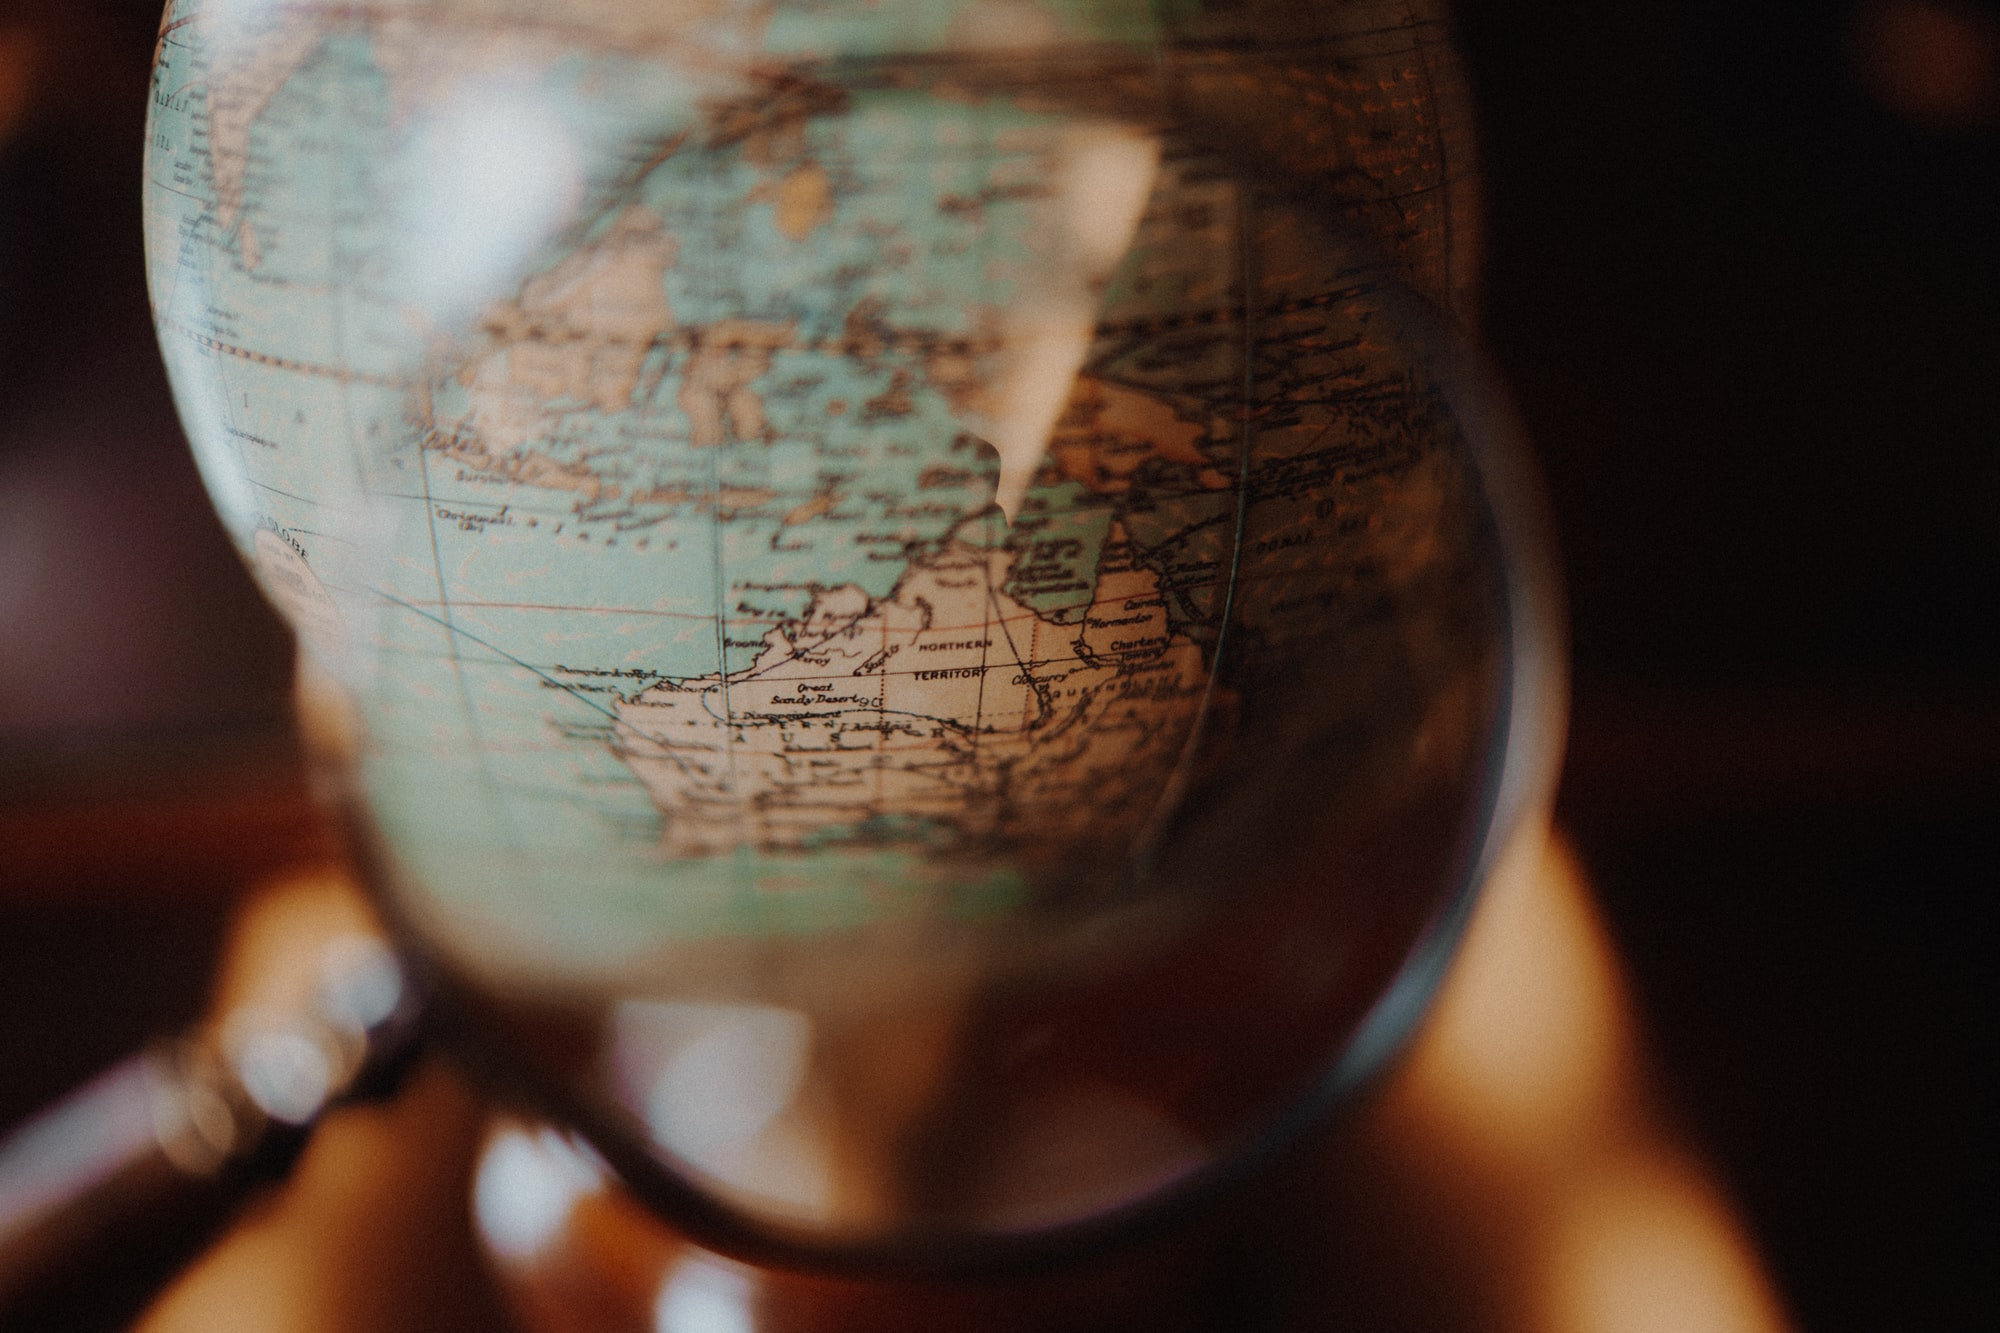 Australia's geoscience paradox threatens its prosperity and sustainability